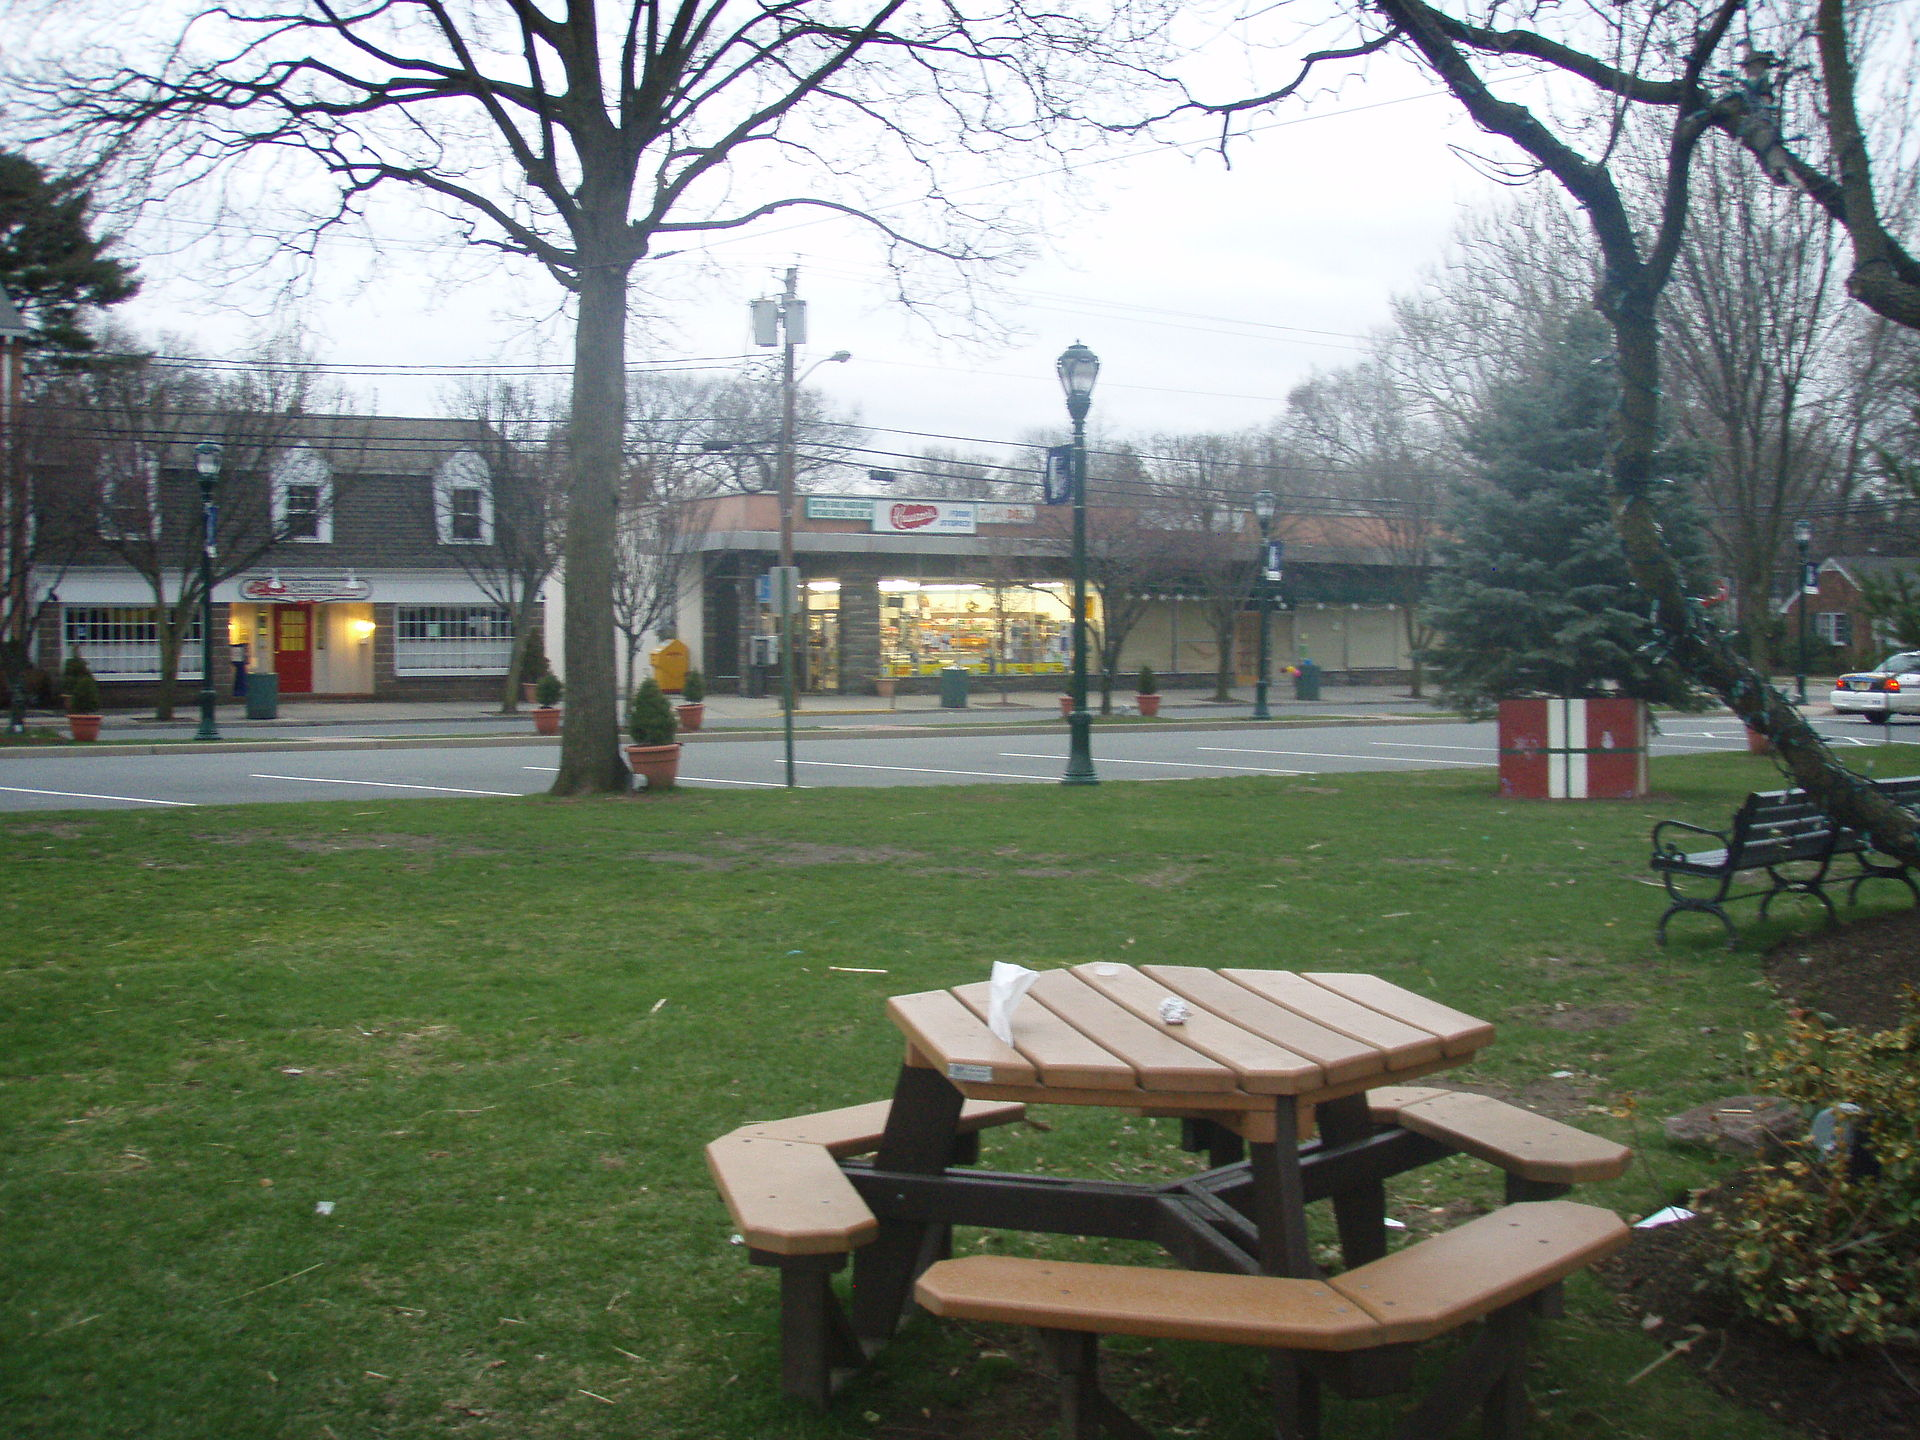 ho ho kus personals Favorite this post mar 26 vintage community wood wagon $30 (ho ho kus) pic map hide this posting restore restore this posting $300 favorite.